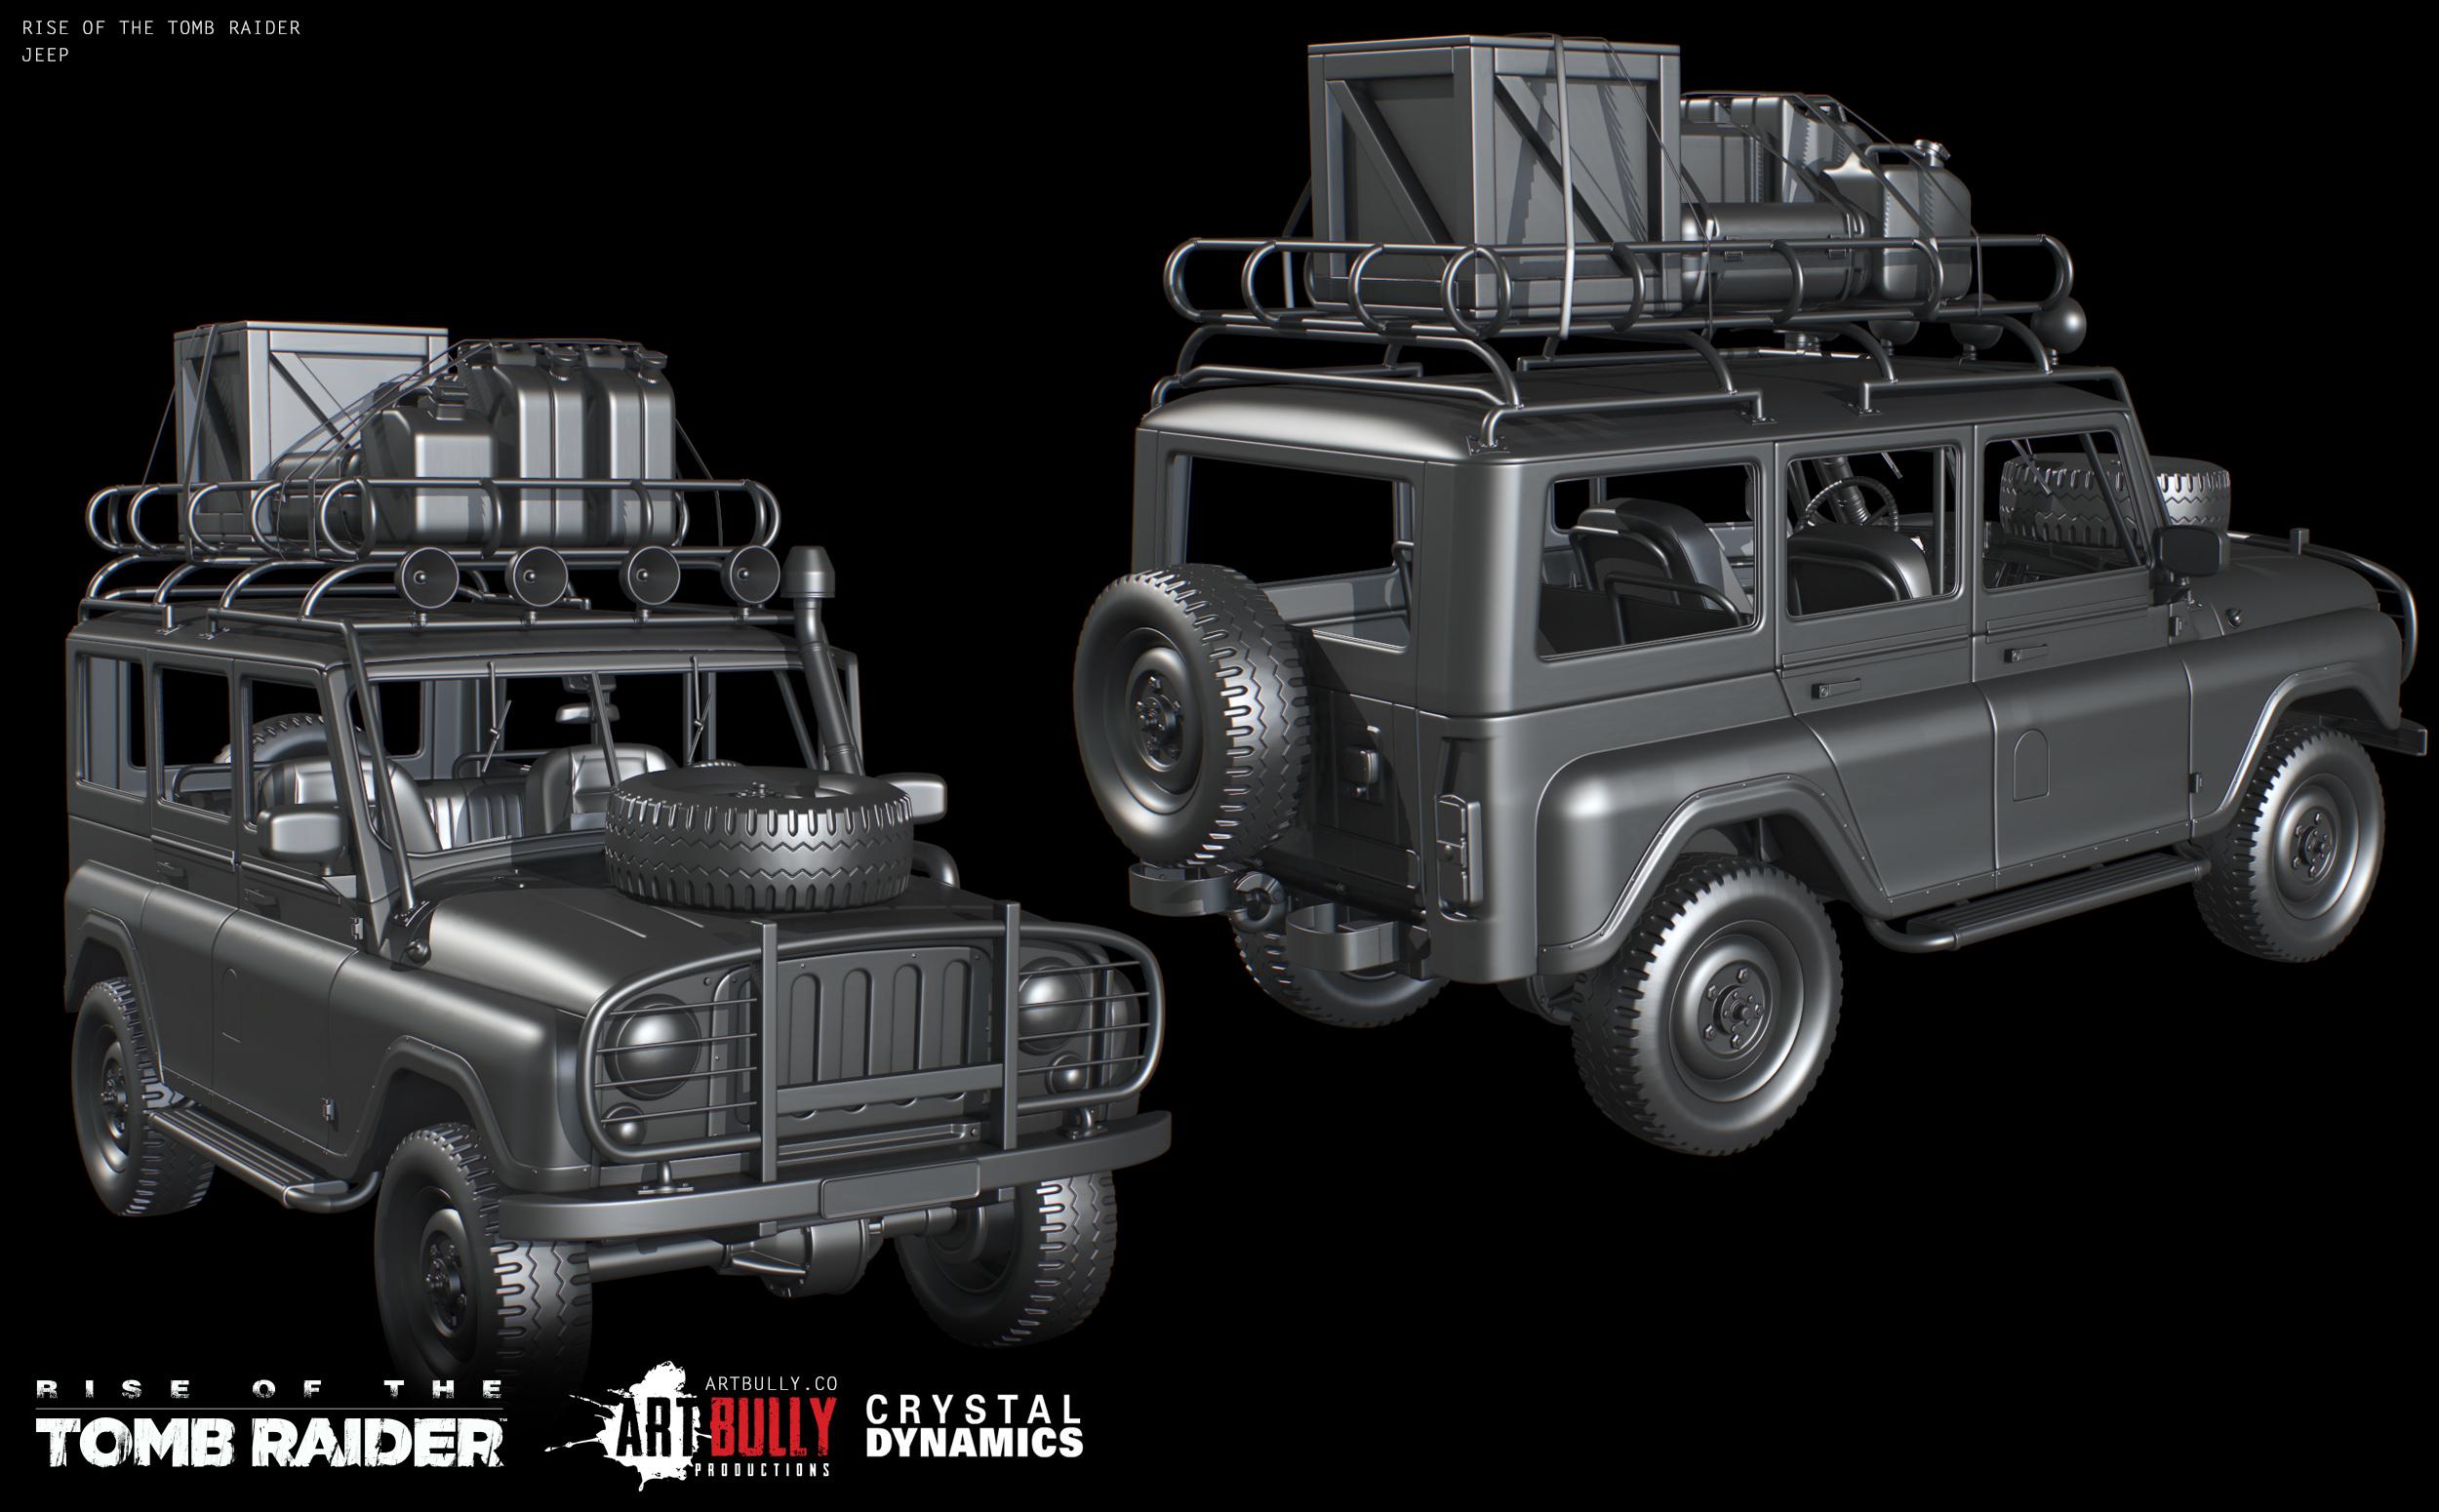 jeep_02 copy.jpg